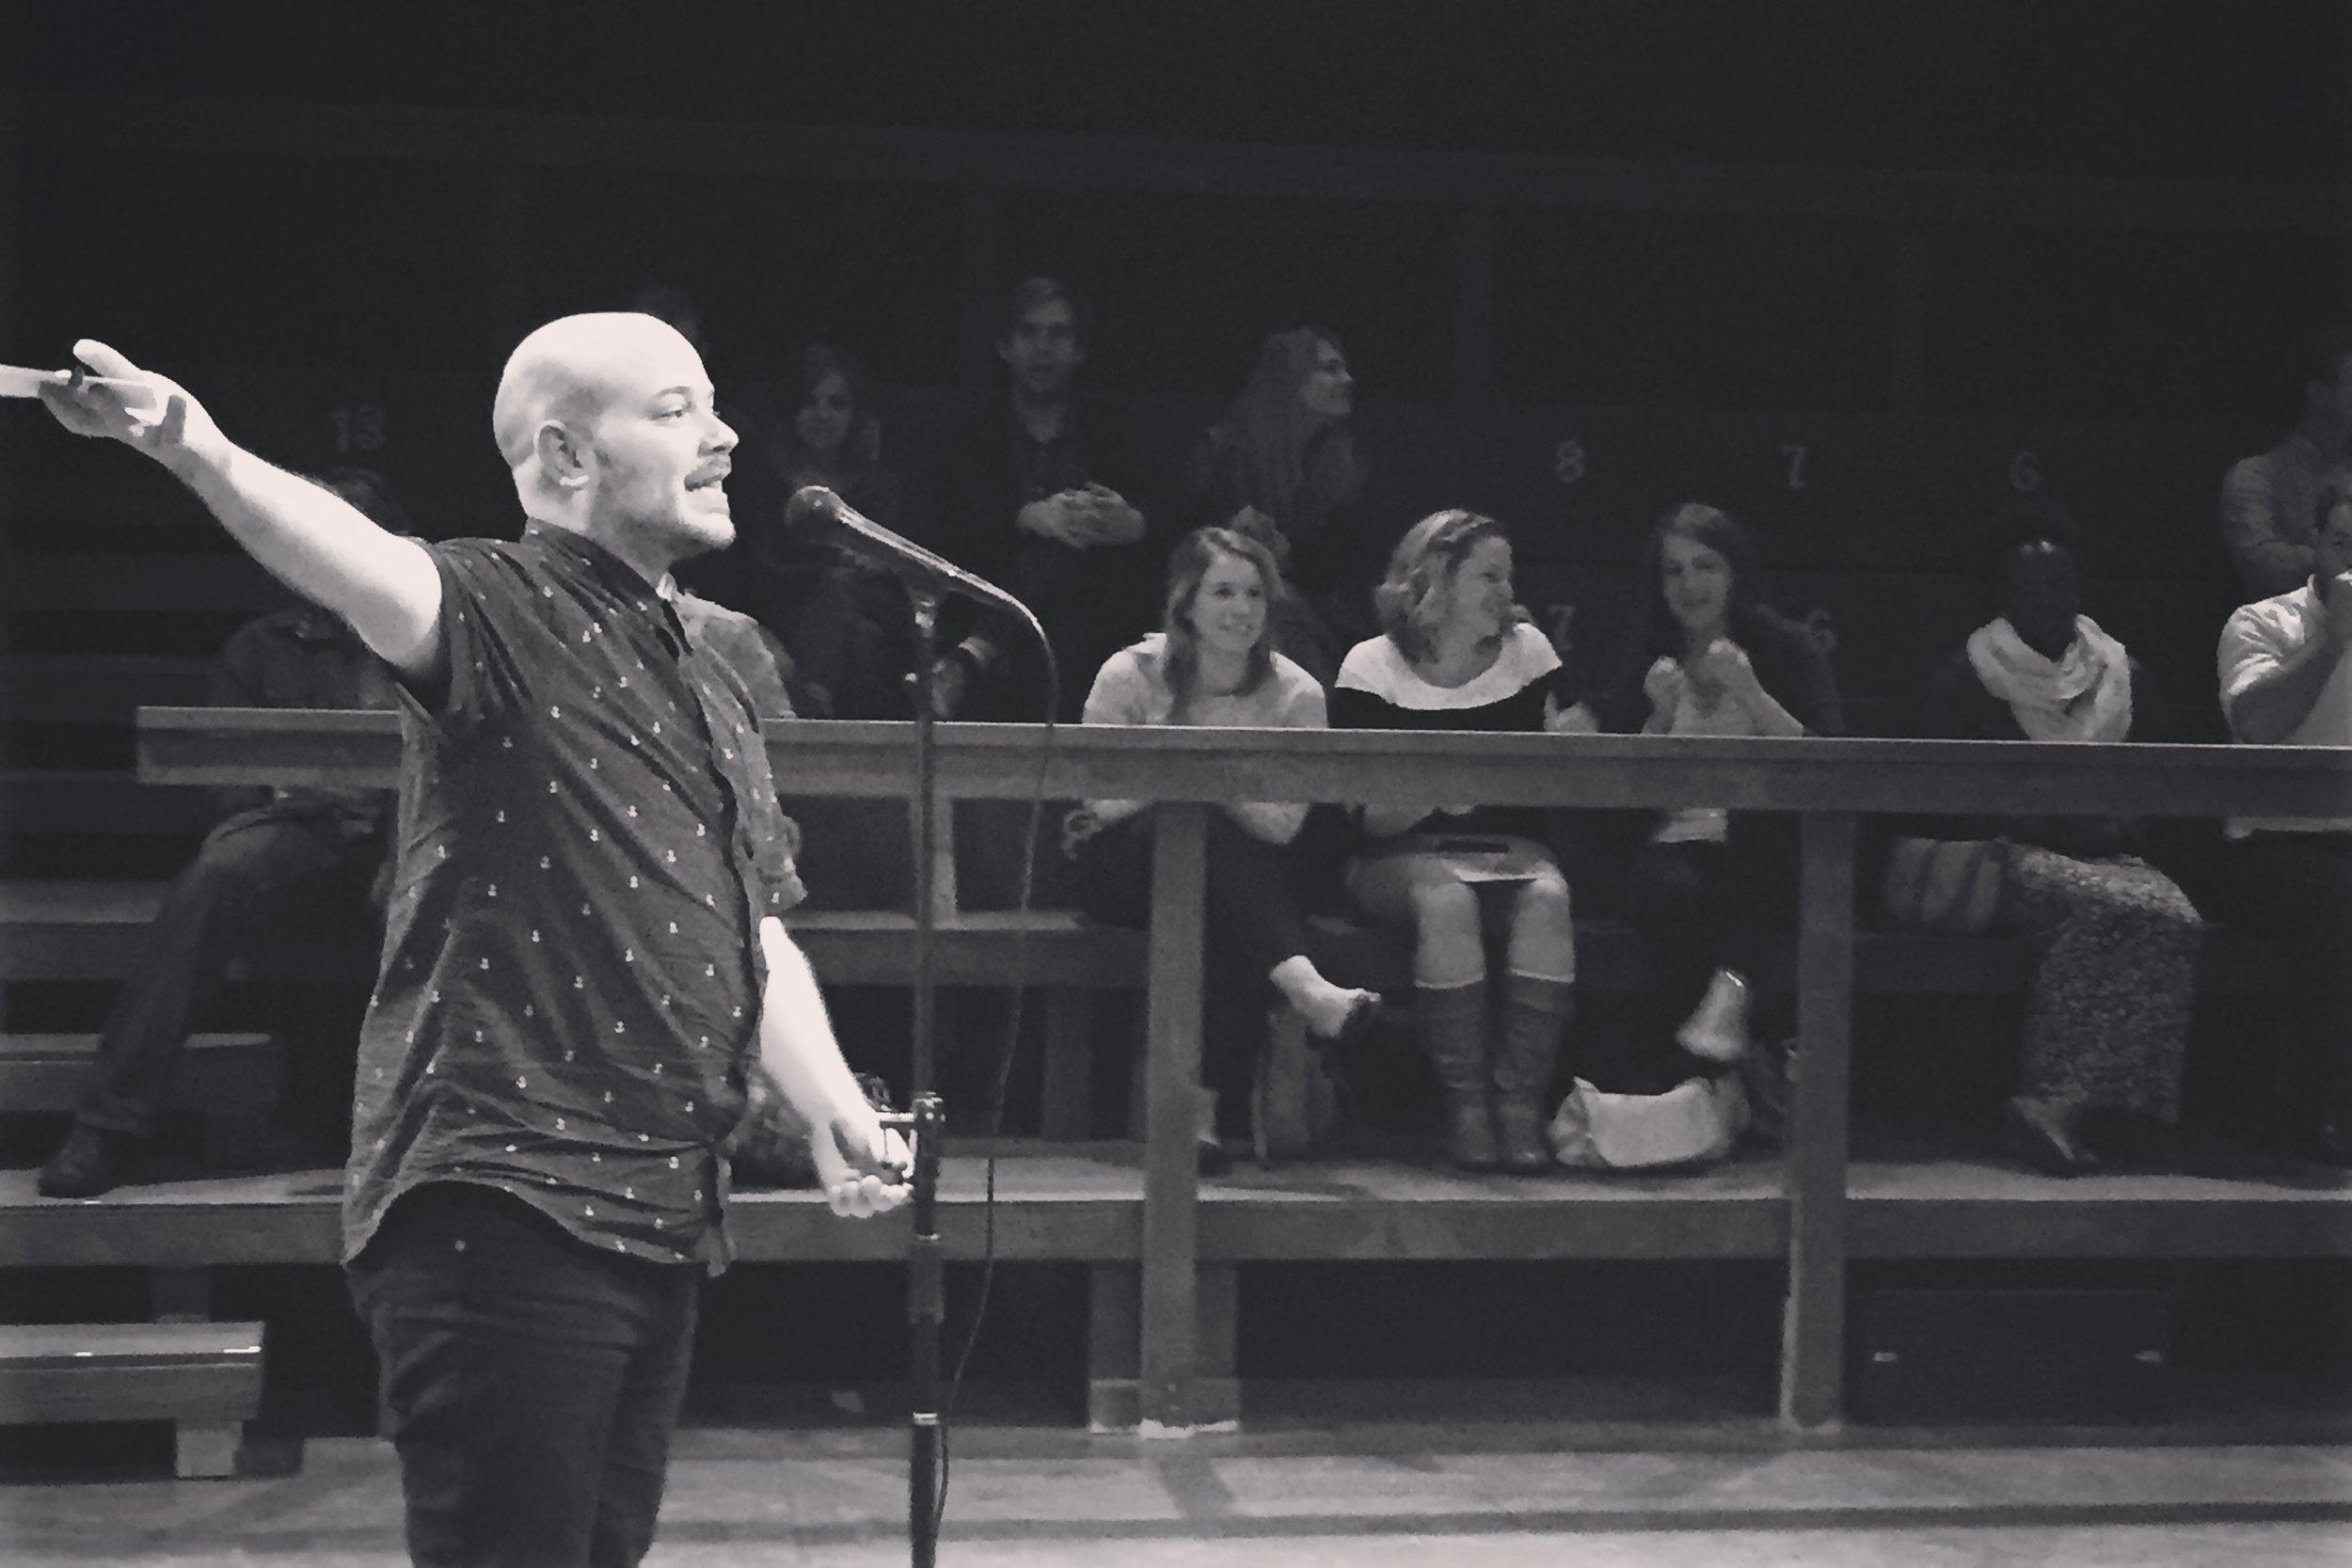 Hosting The Porch storytelling show in Salt Lake City, Utah in 2015.